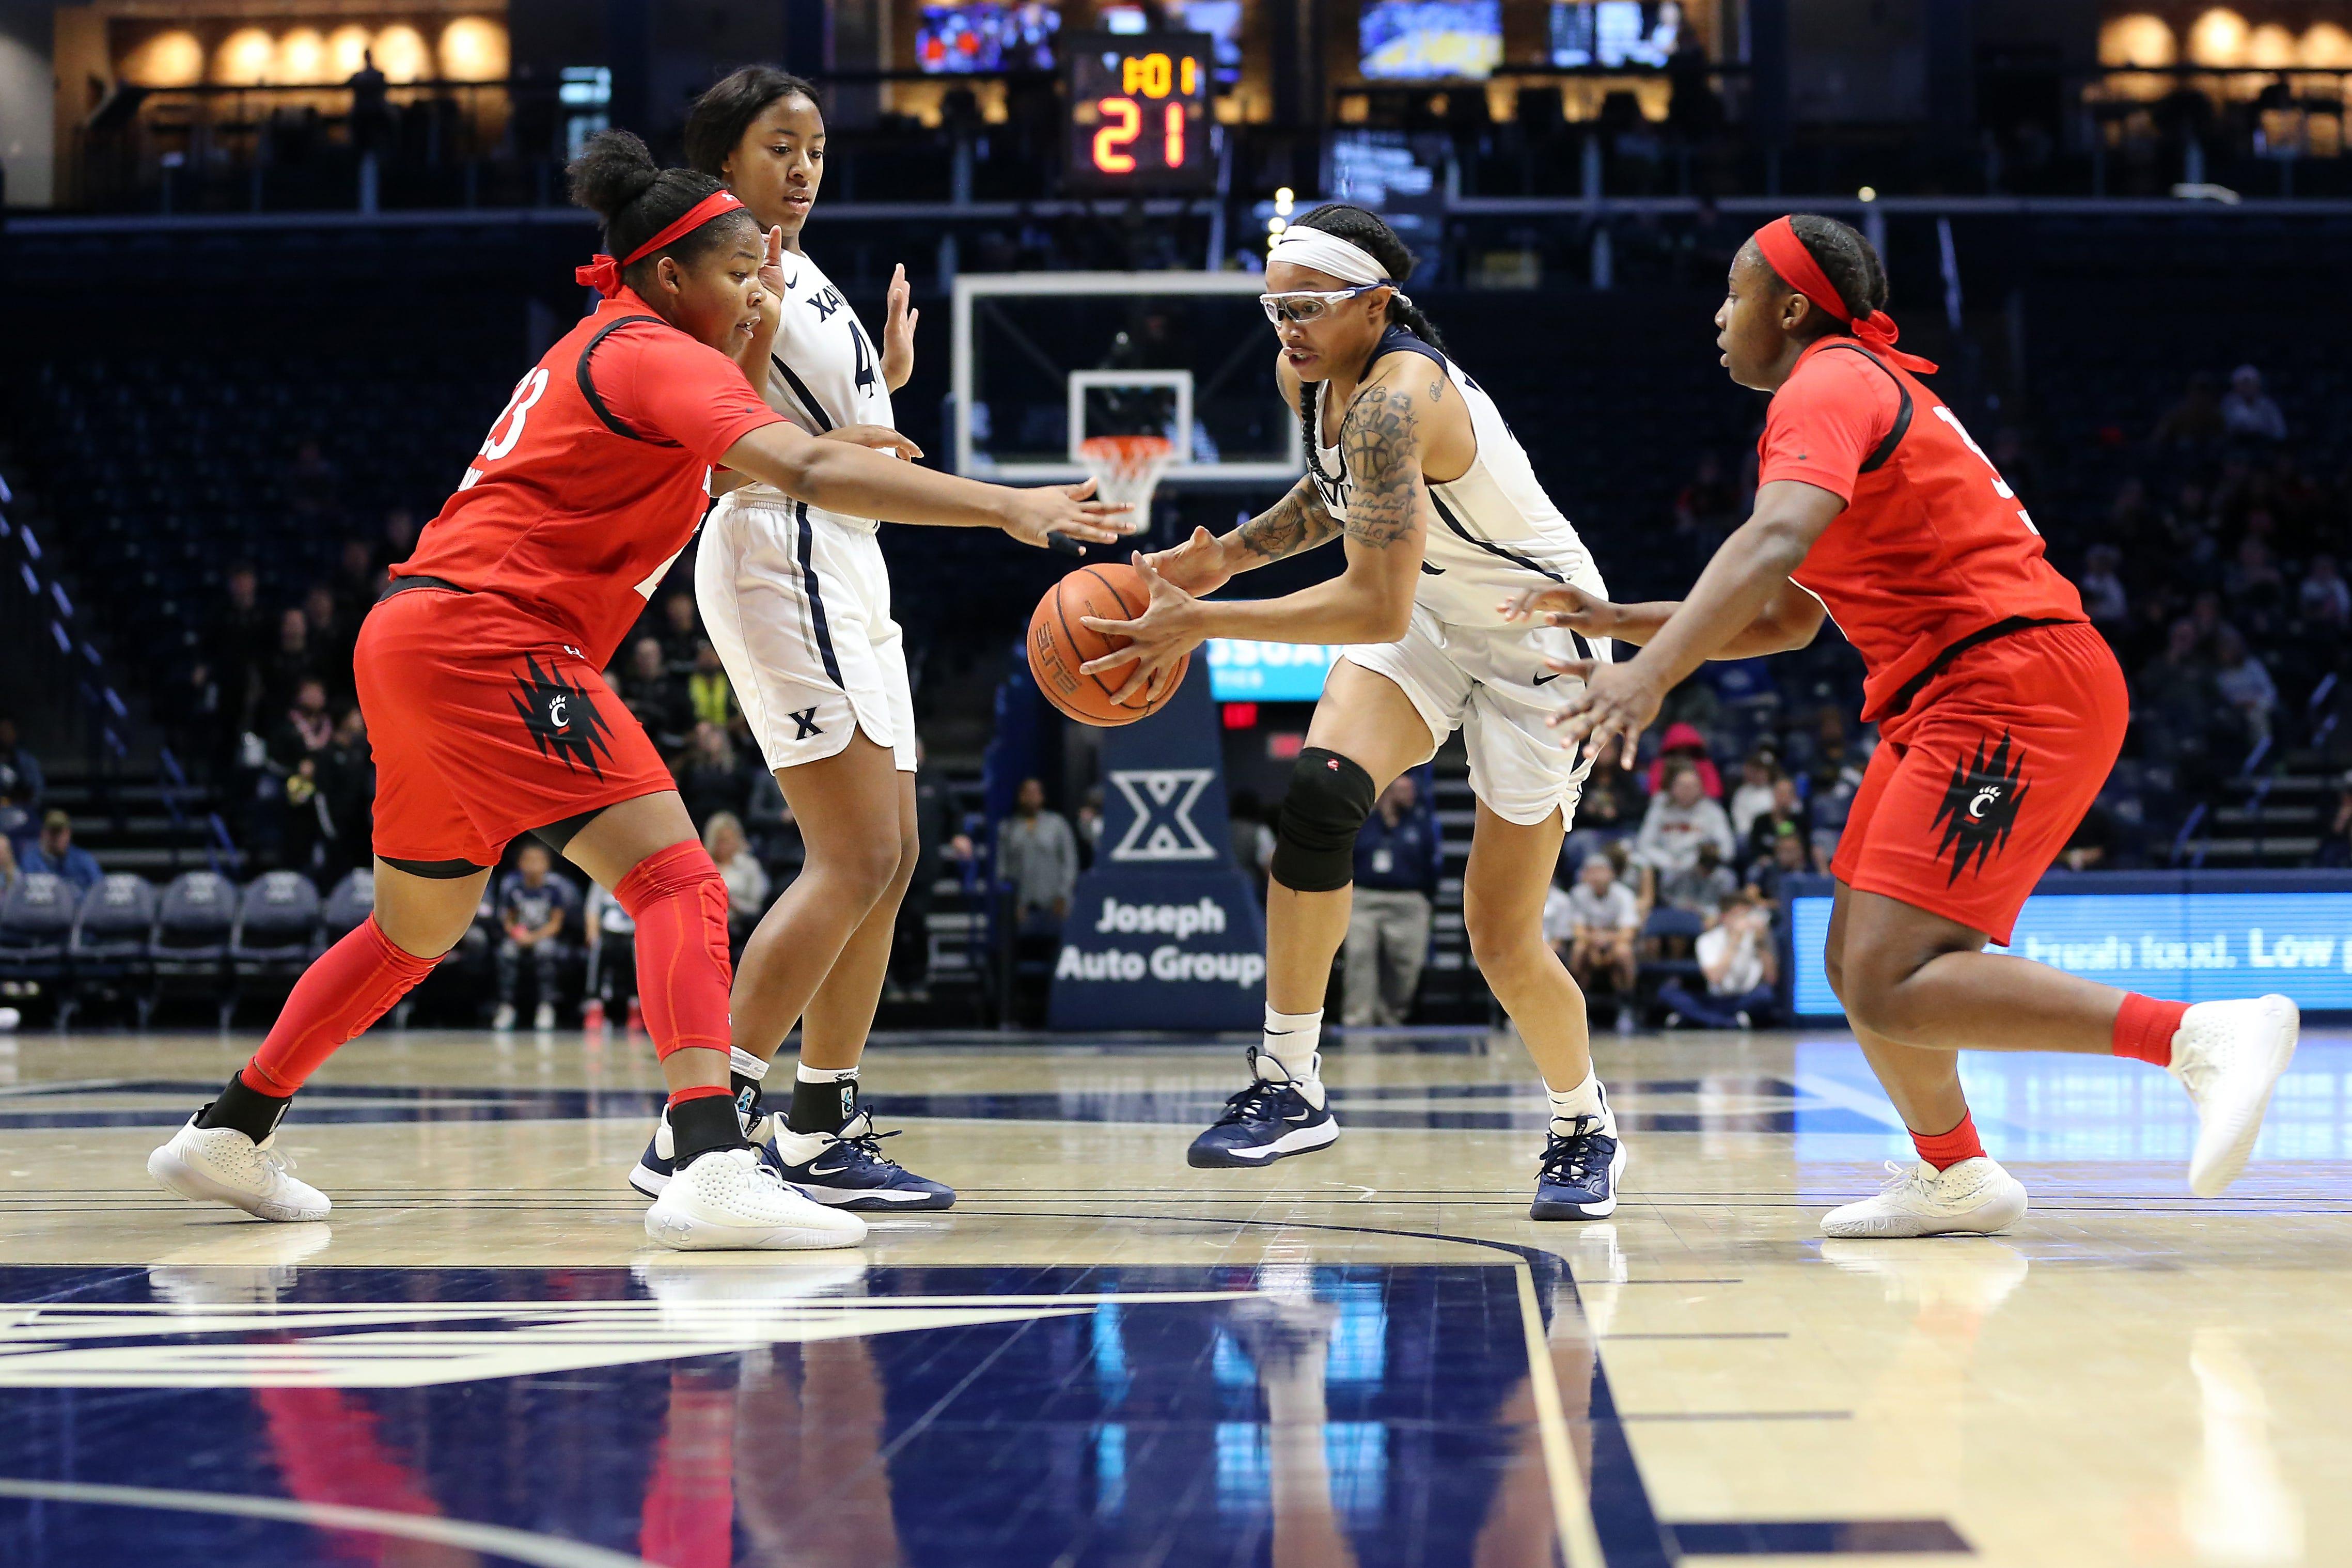 NCAA Women's Basketball: Cincinnati Bearcats vs. Xavier Musketeers, Dec. 14